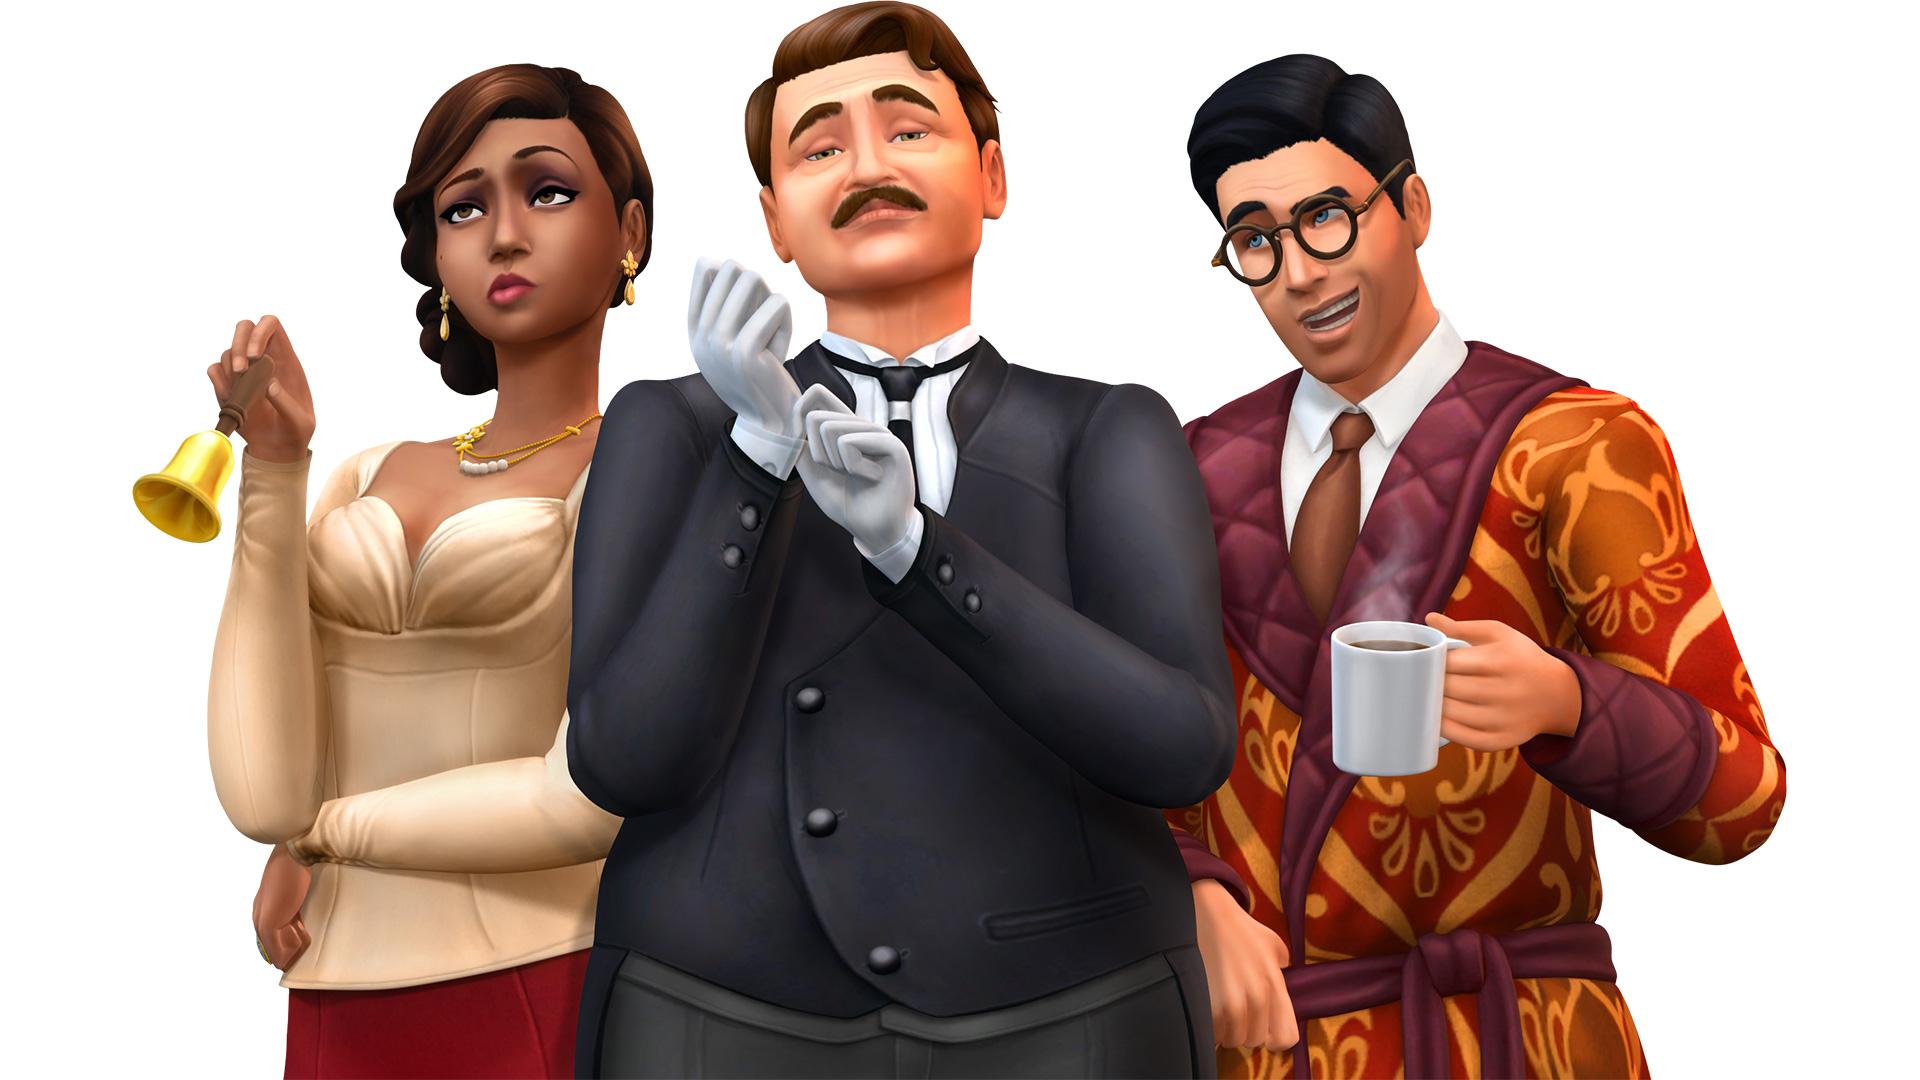 Die Sims 4 Vintage Glamour Accessoires Lets Playsde